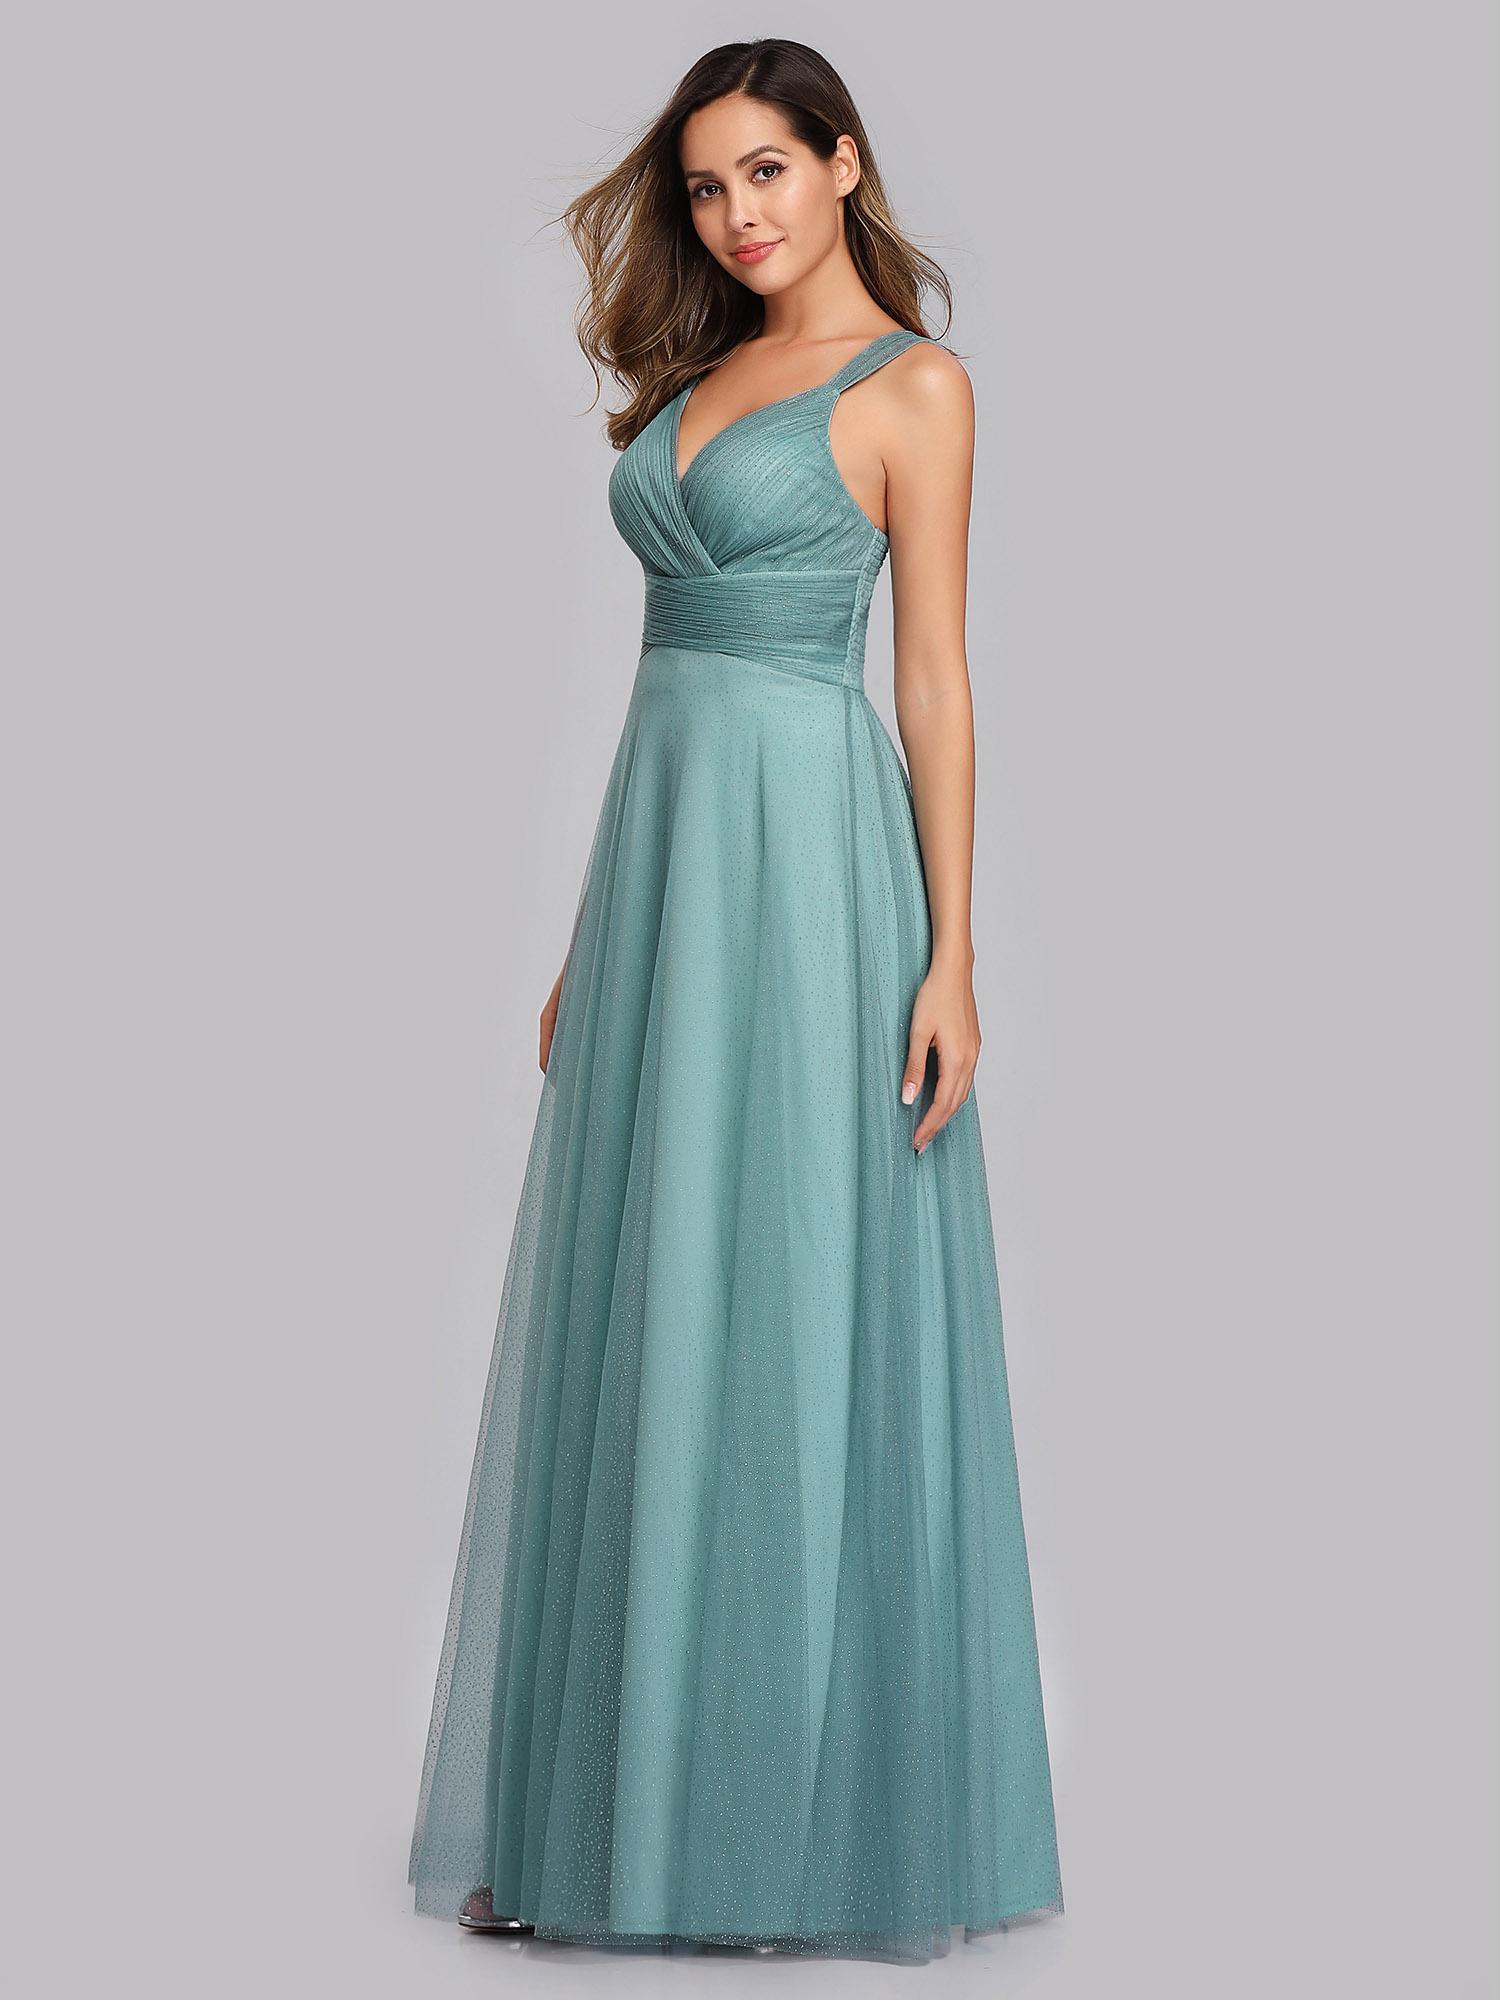 Ever-Pretty US Celebrity Party Dress Sleeveless V-neck Prom Wedding Gowns 07905